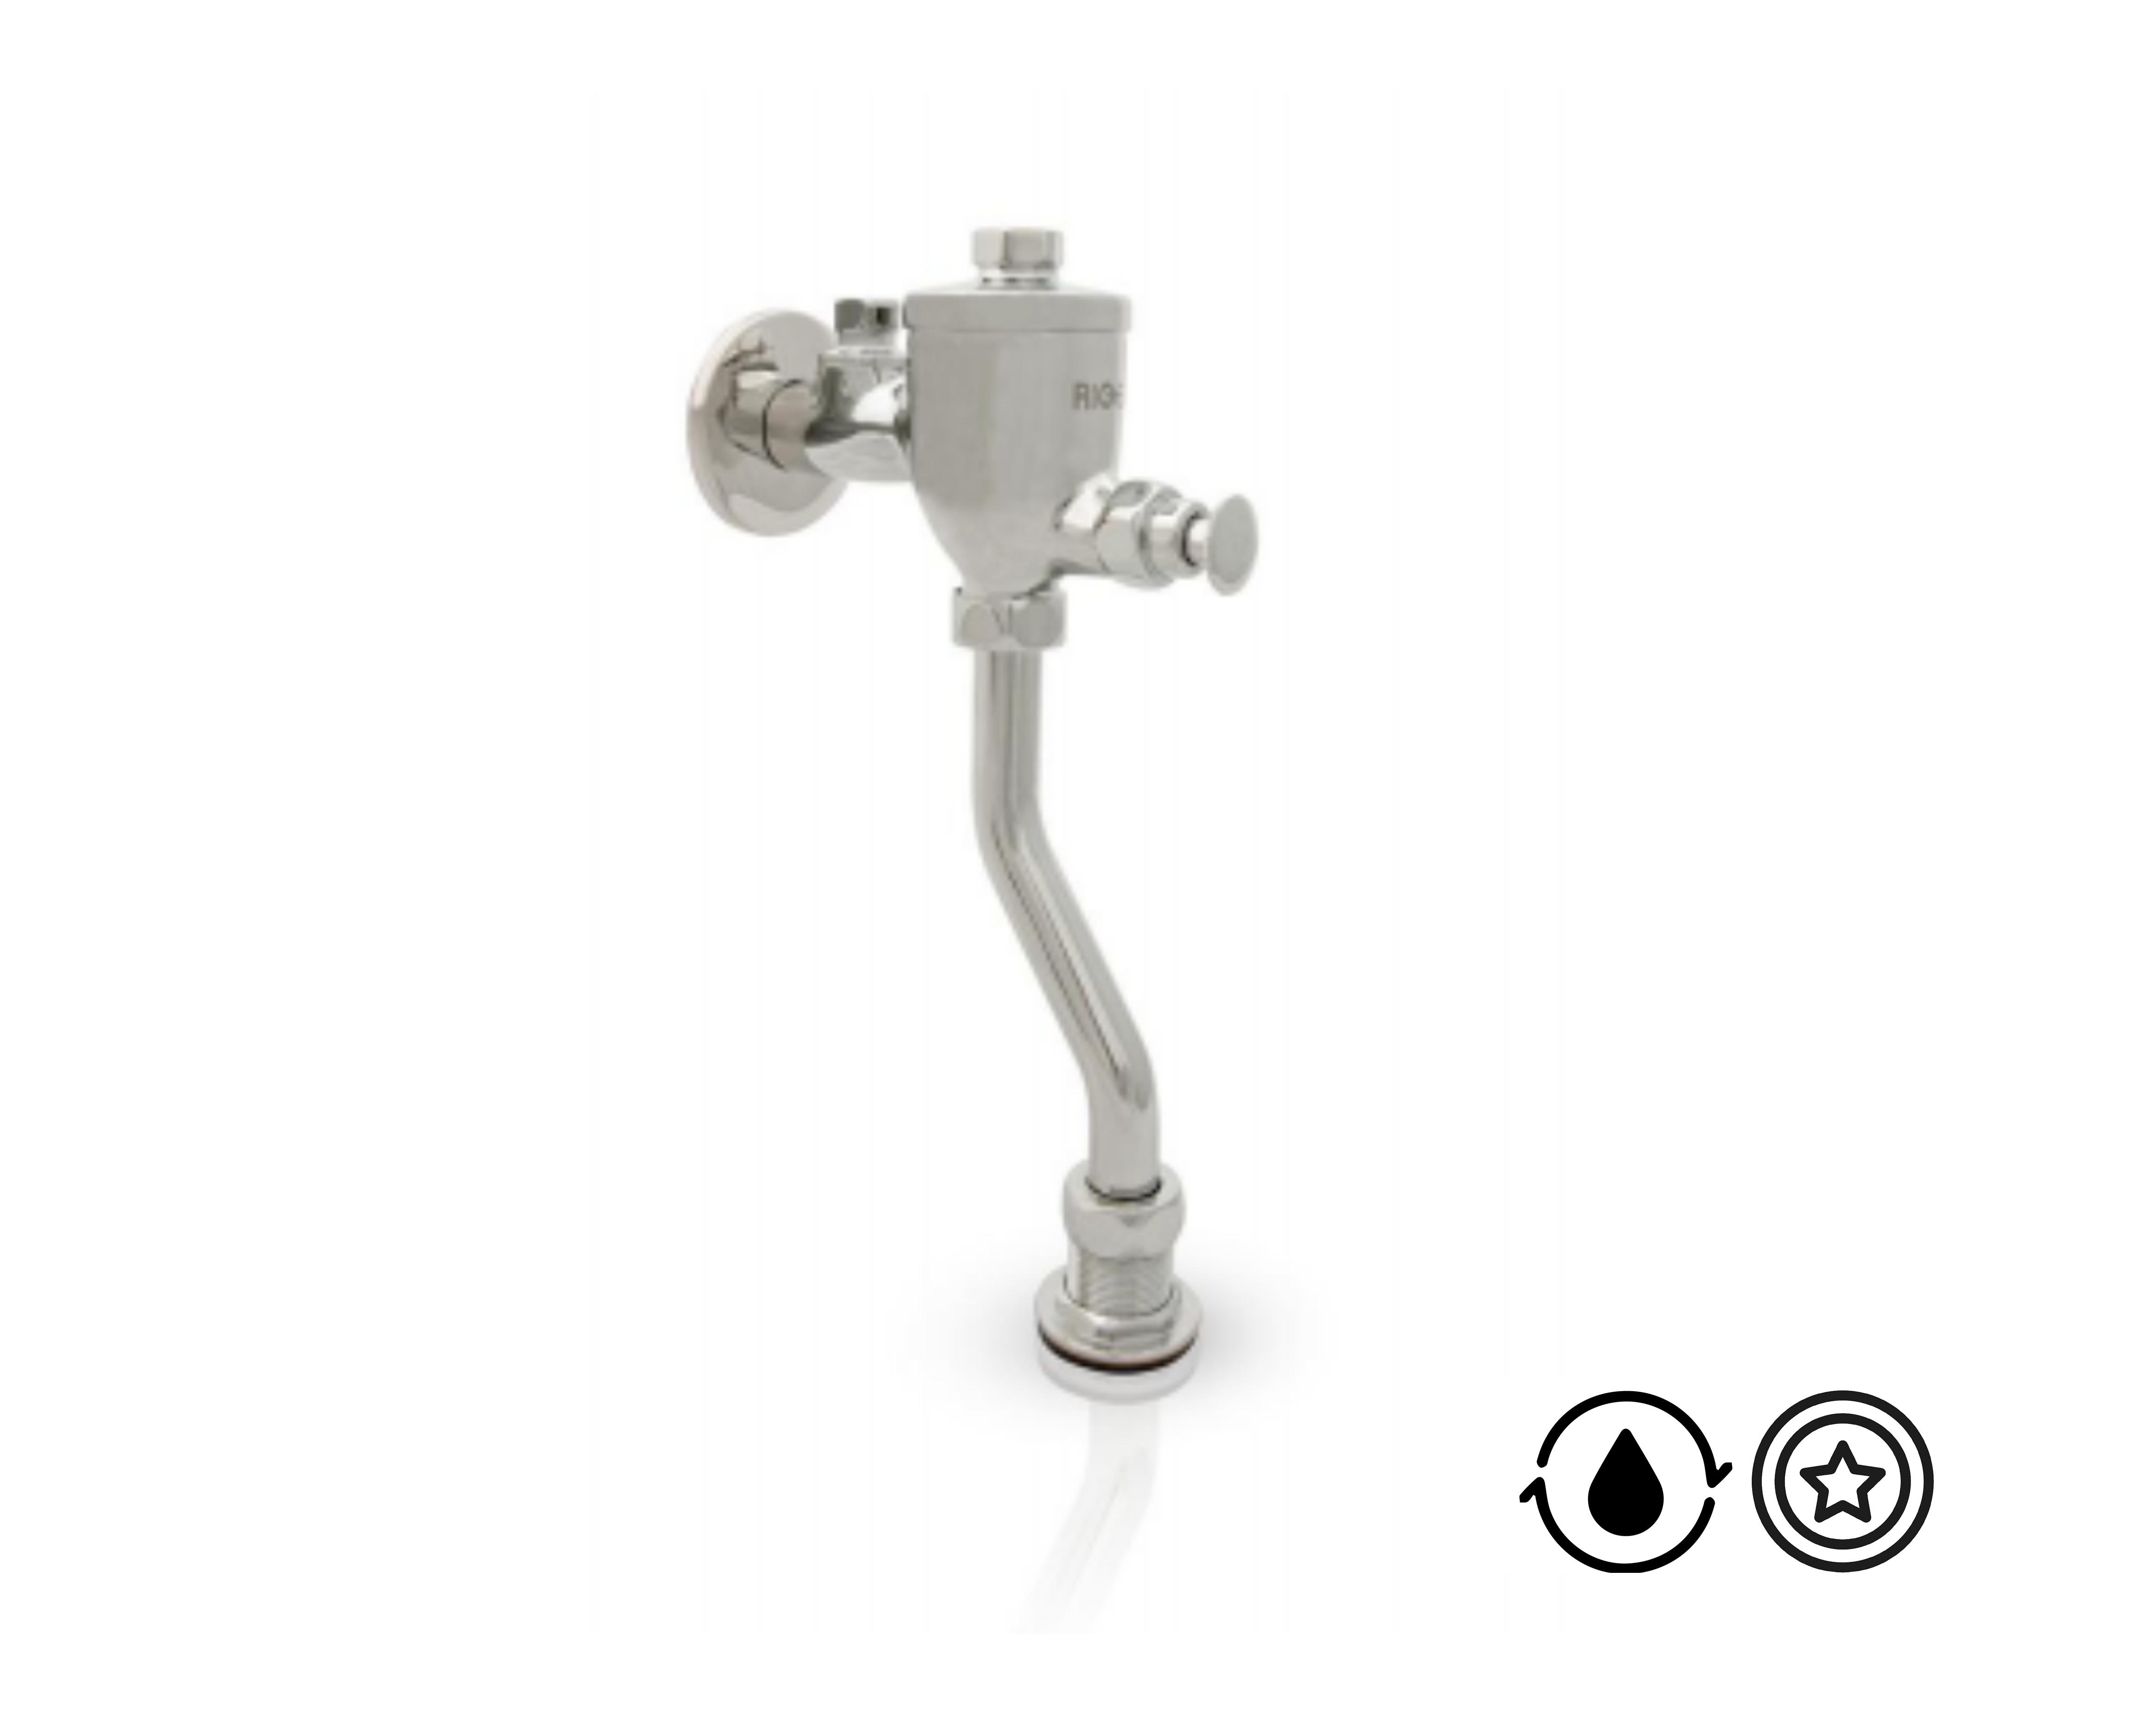 Válvula de Descarga Táctil FU102P Rigel